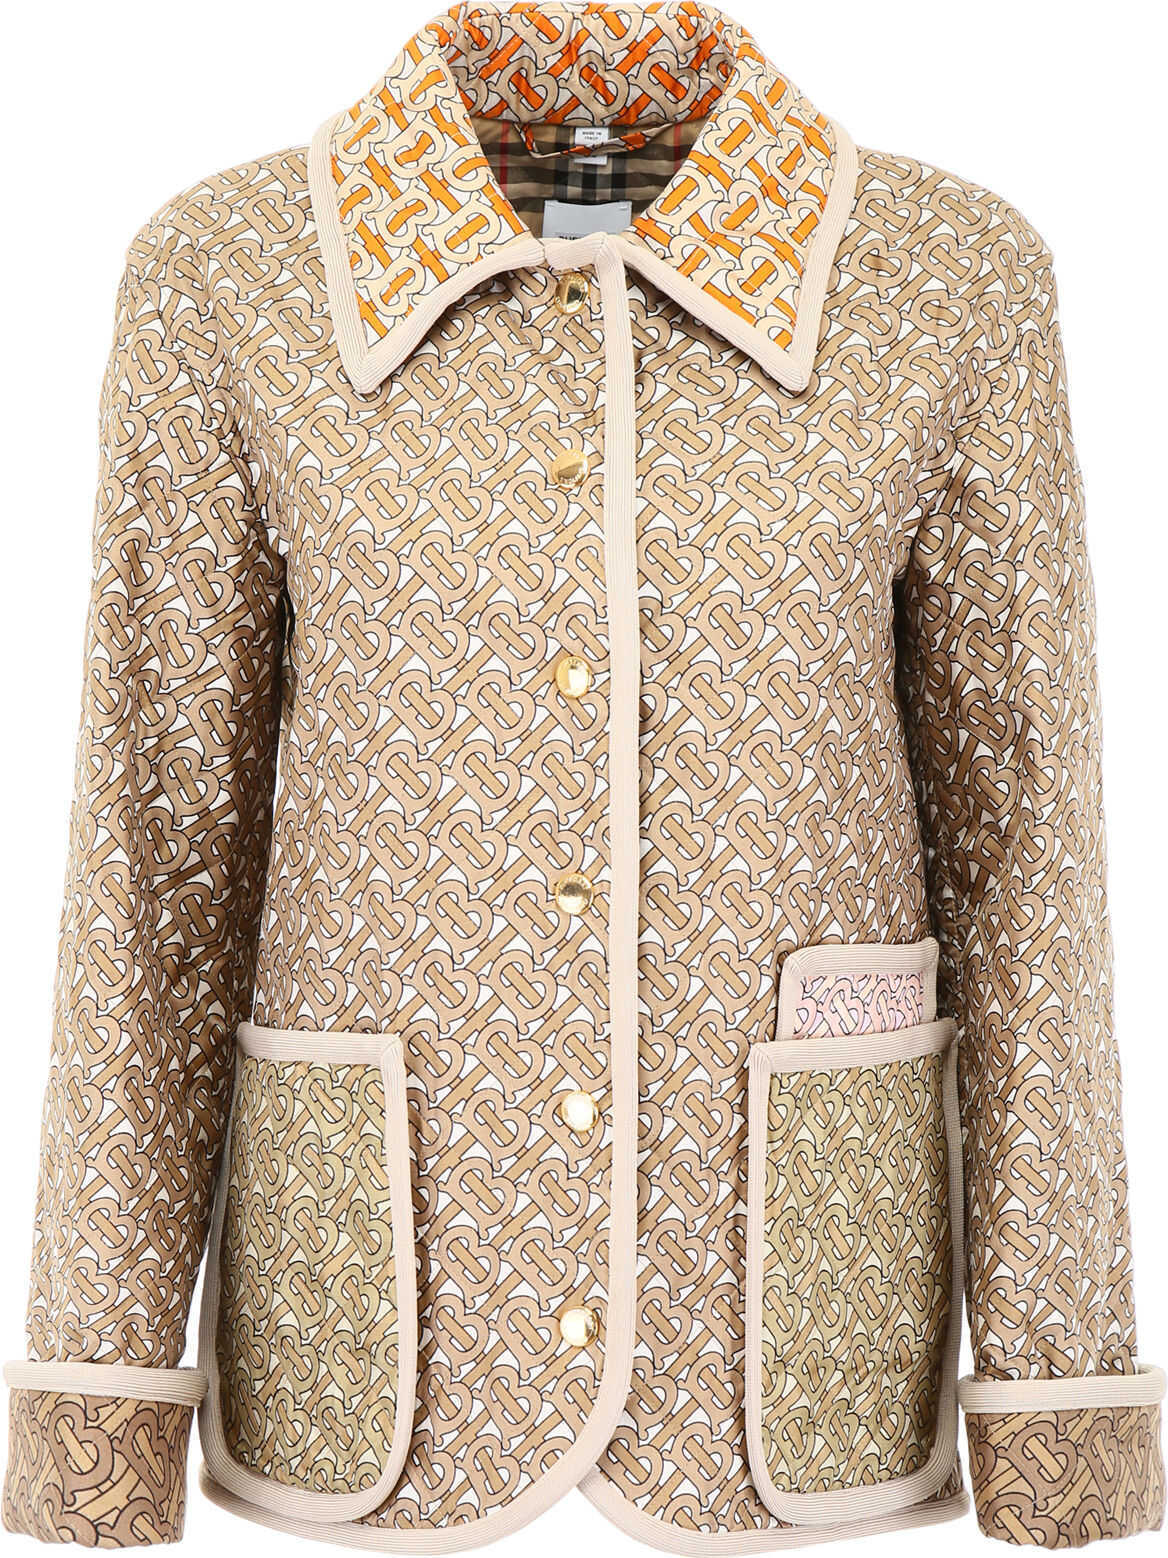 Burberry Monogram Jacket ARCHIVE BEIGE